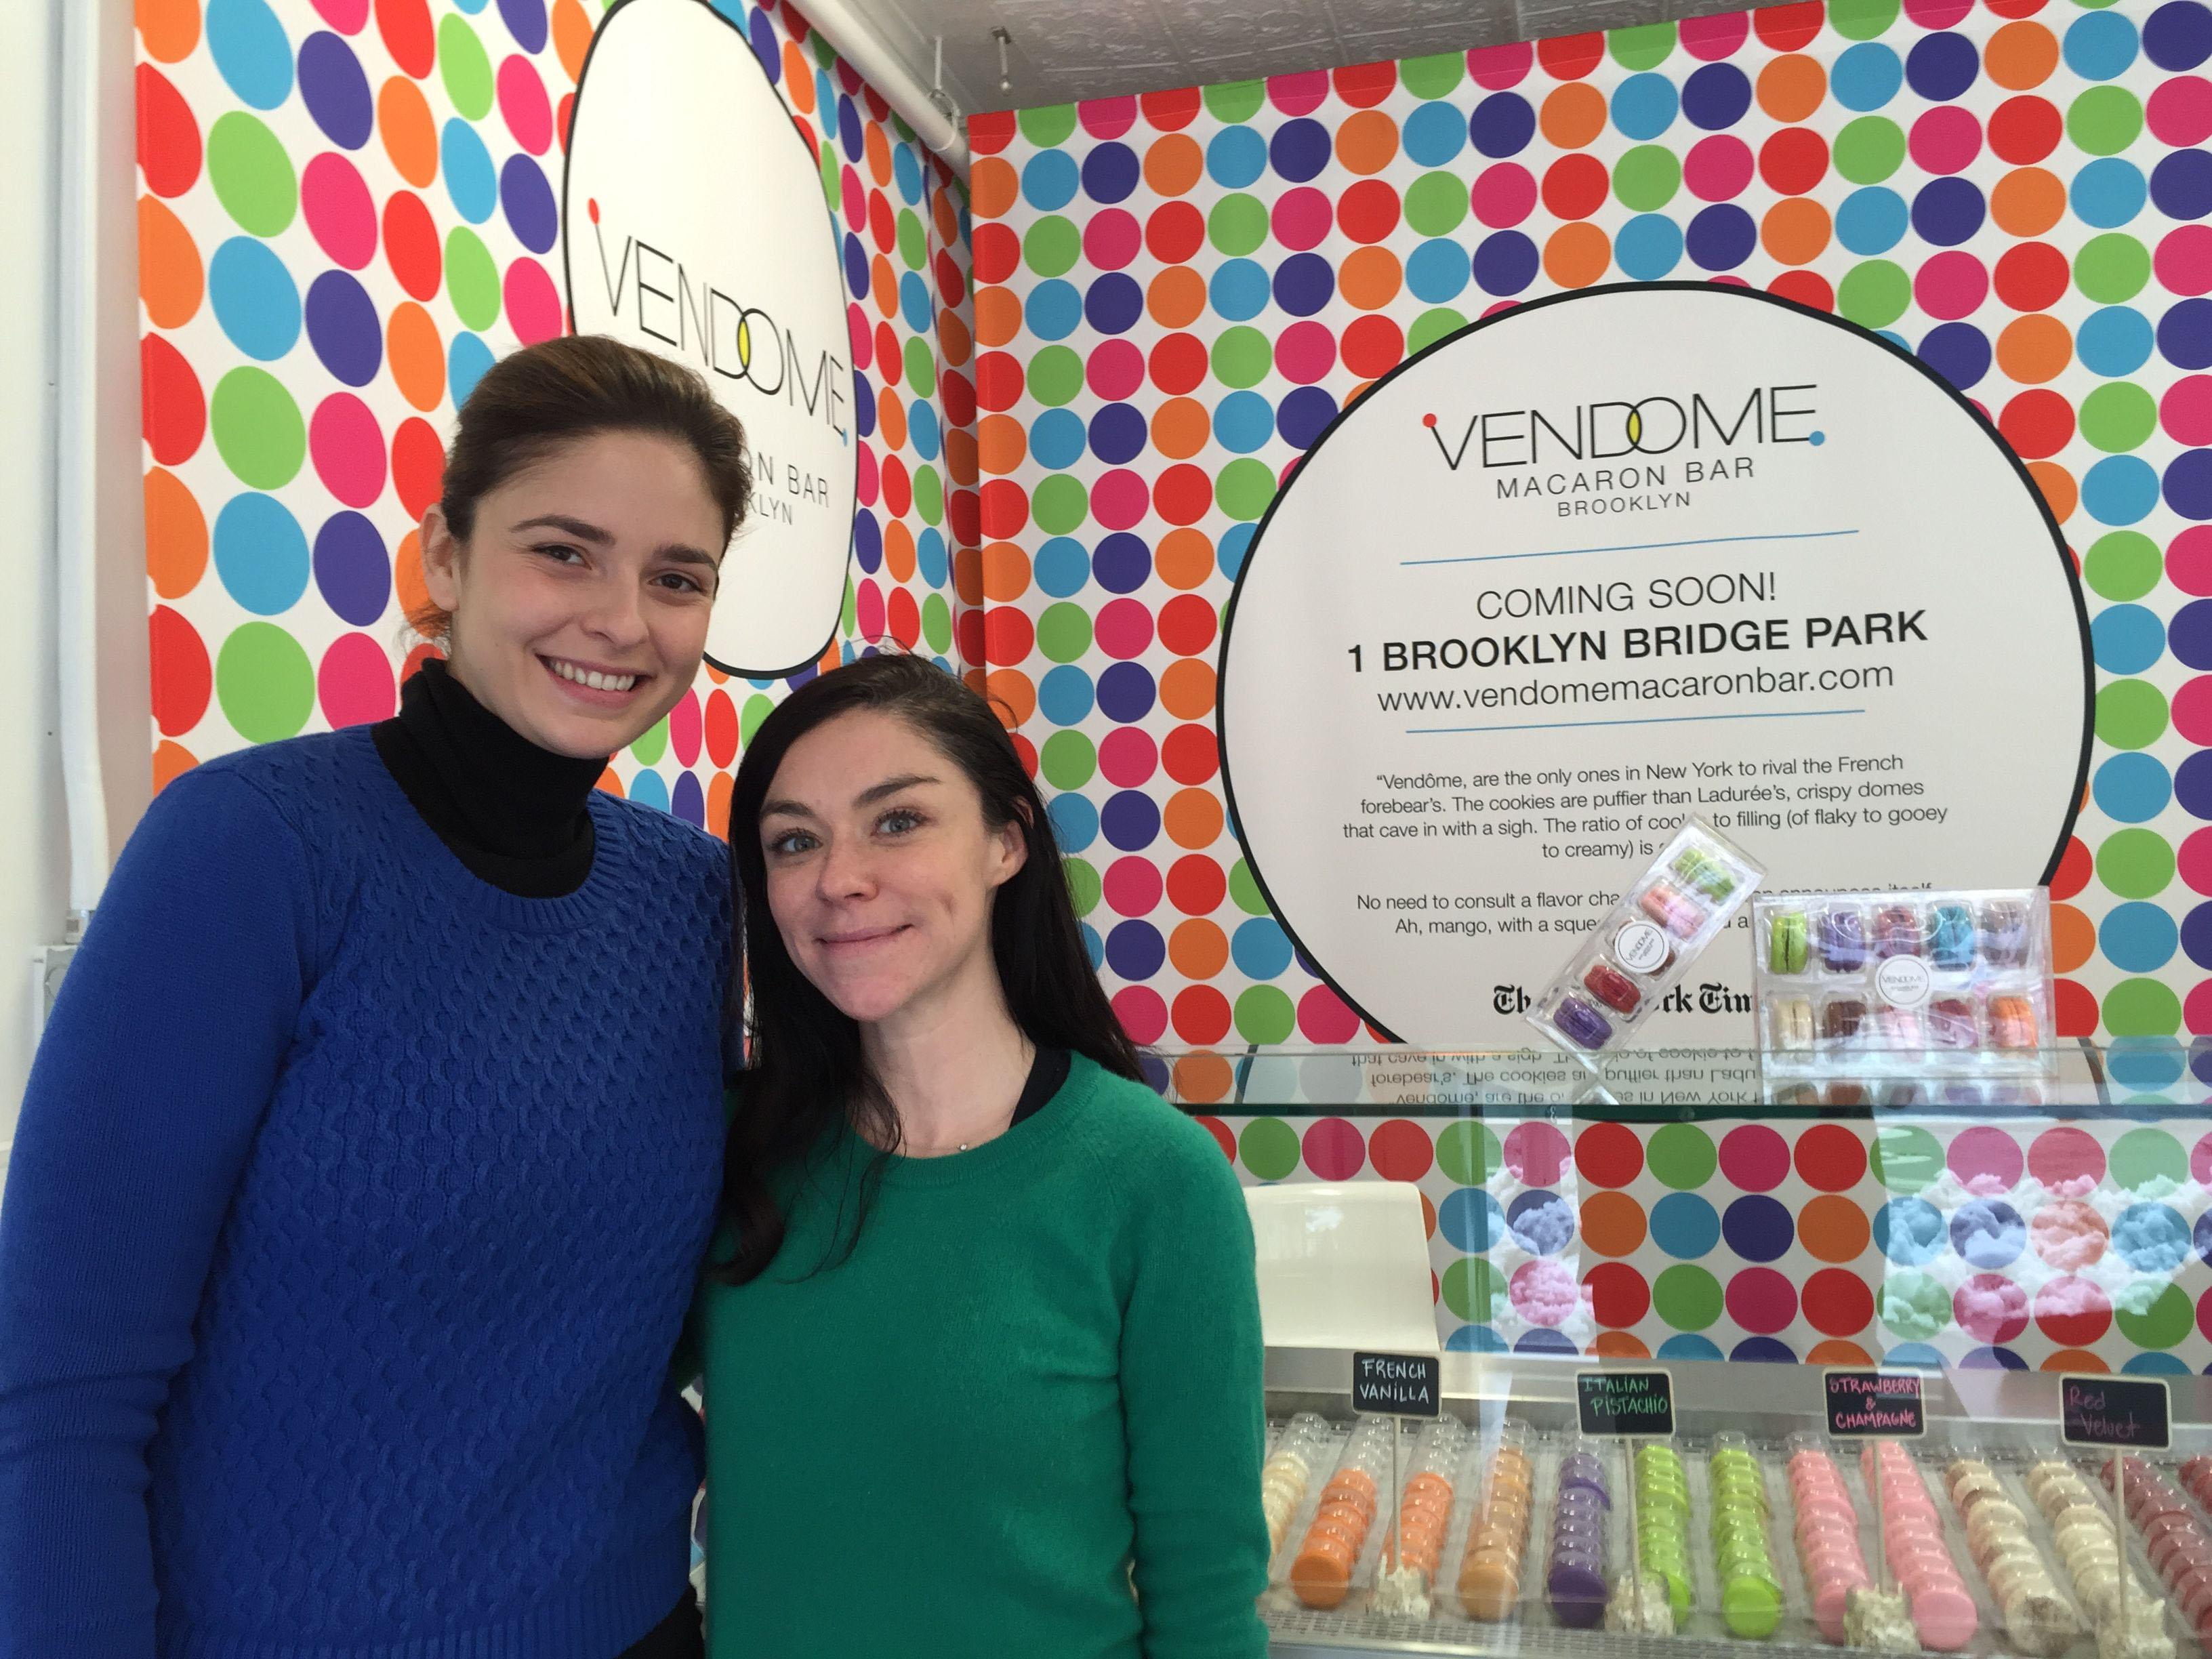 Adriana Troli and Taryn Garcia of Vendome in Brooklyn